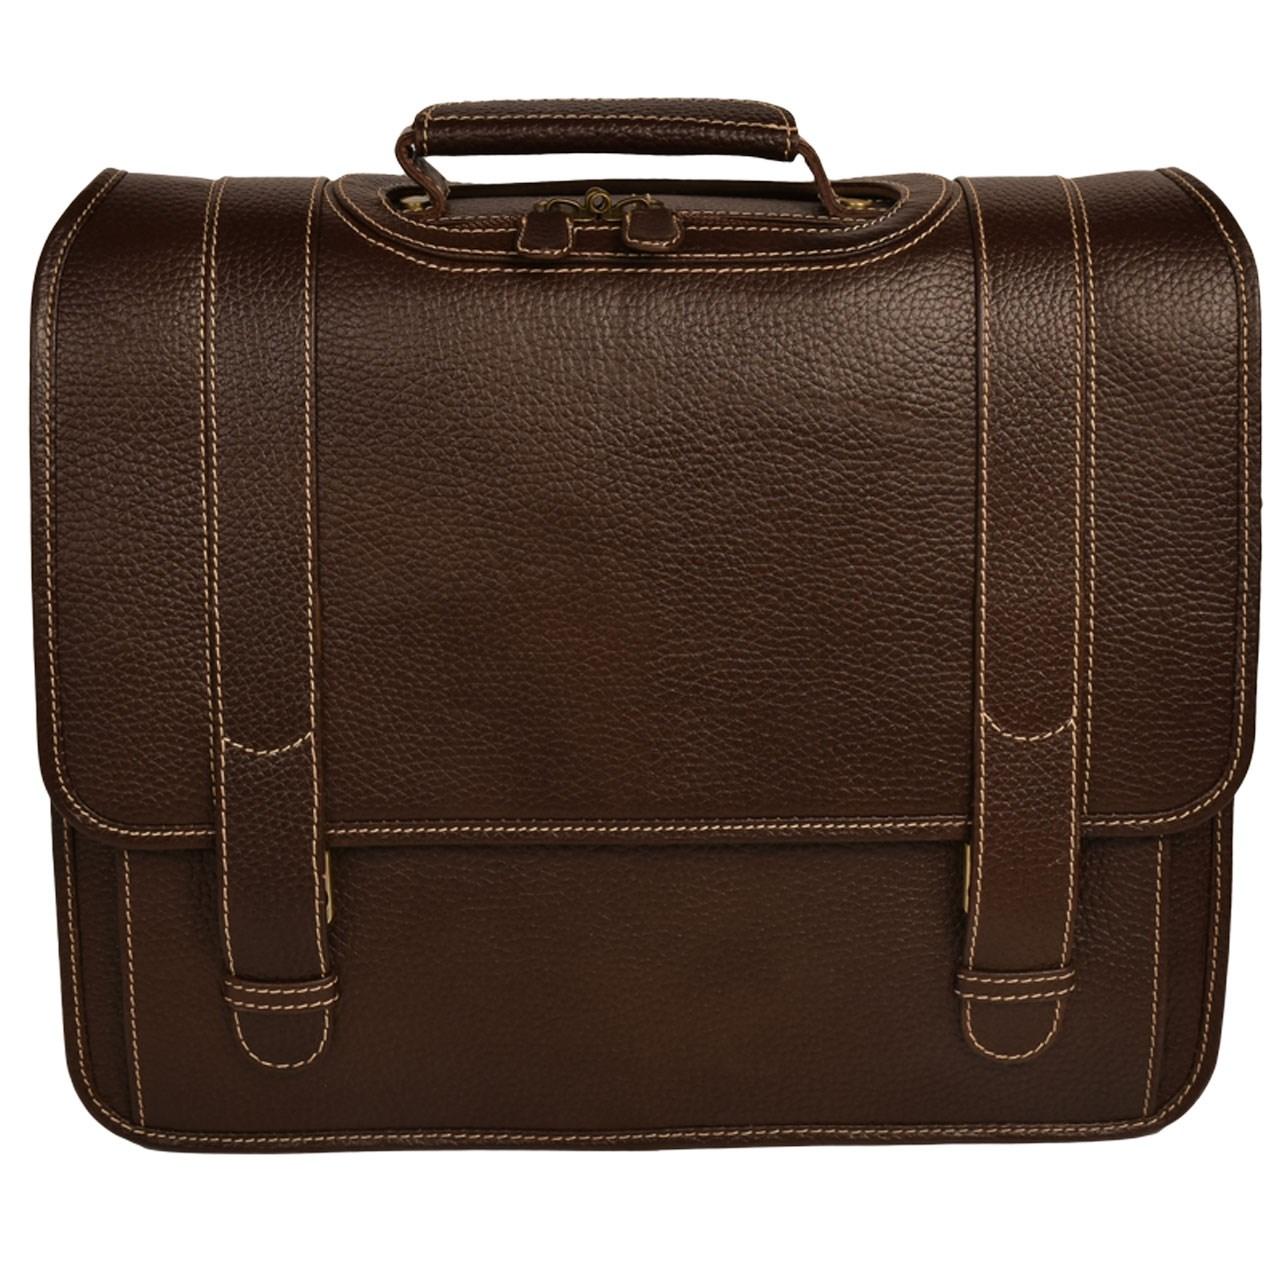 کیف اداری چرم طبیعی کهن چرم مدل LT1-15